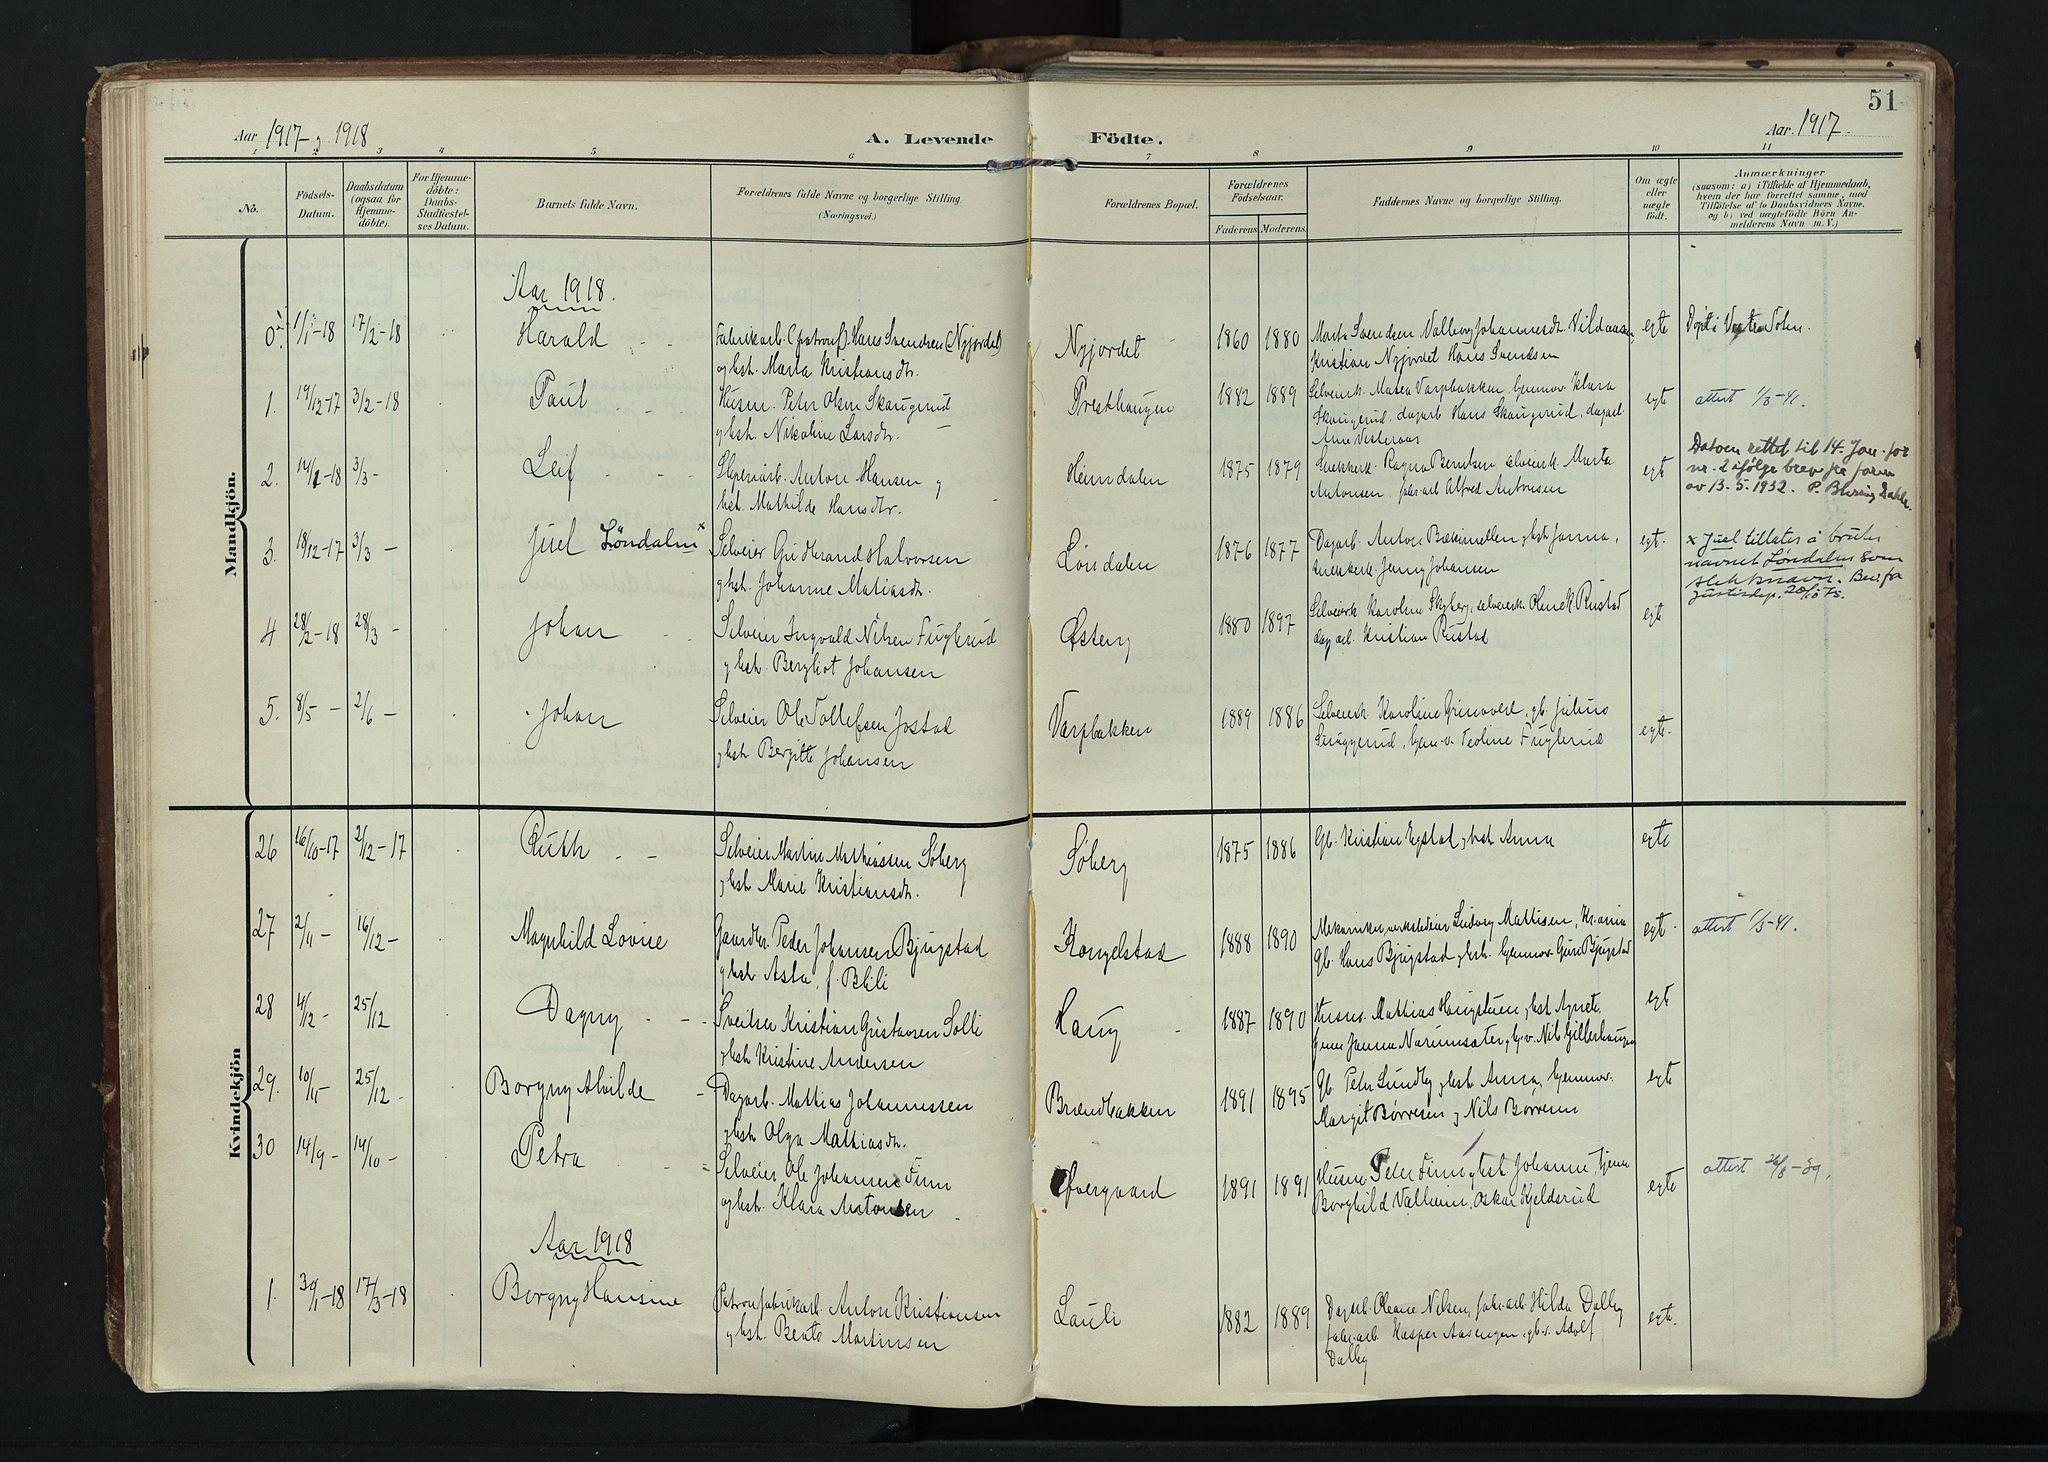 SAH, Vardal prestekontor, H/Ha/Haa/L0020: Ministerialbok nr. 20, 1907-1921, s. 51